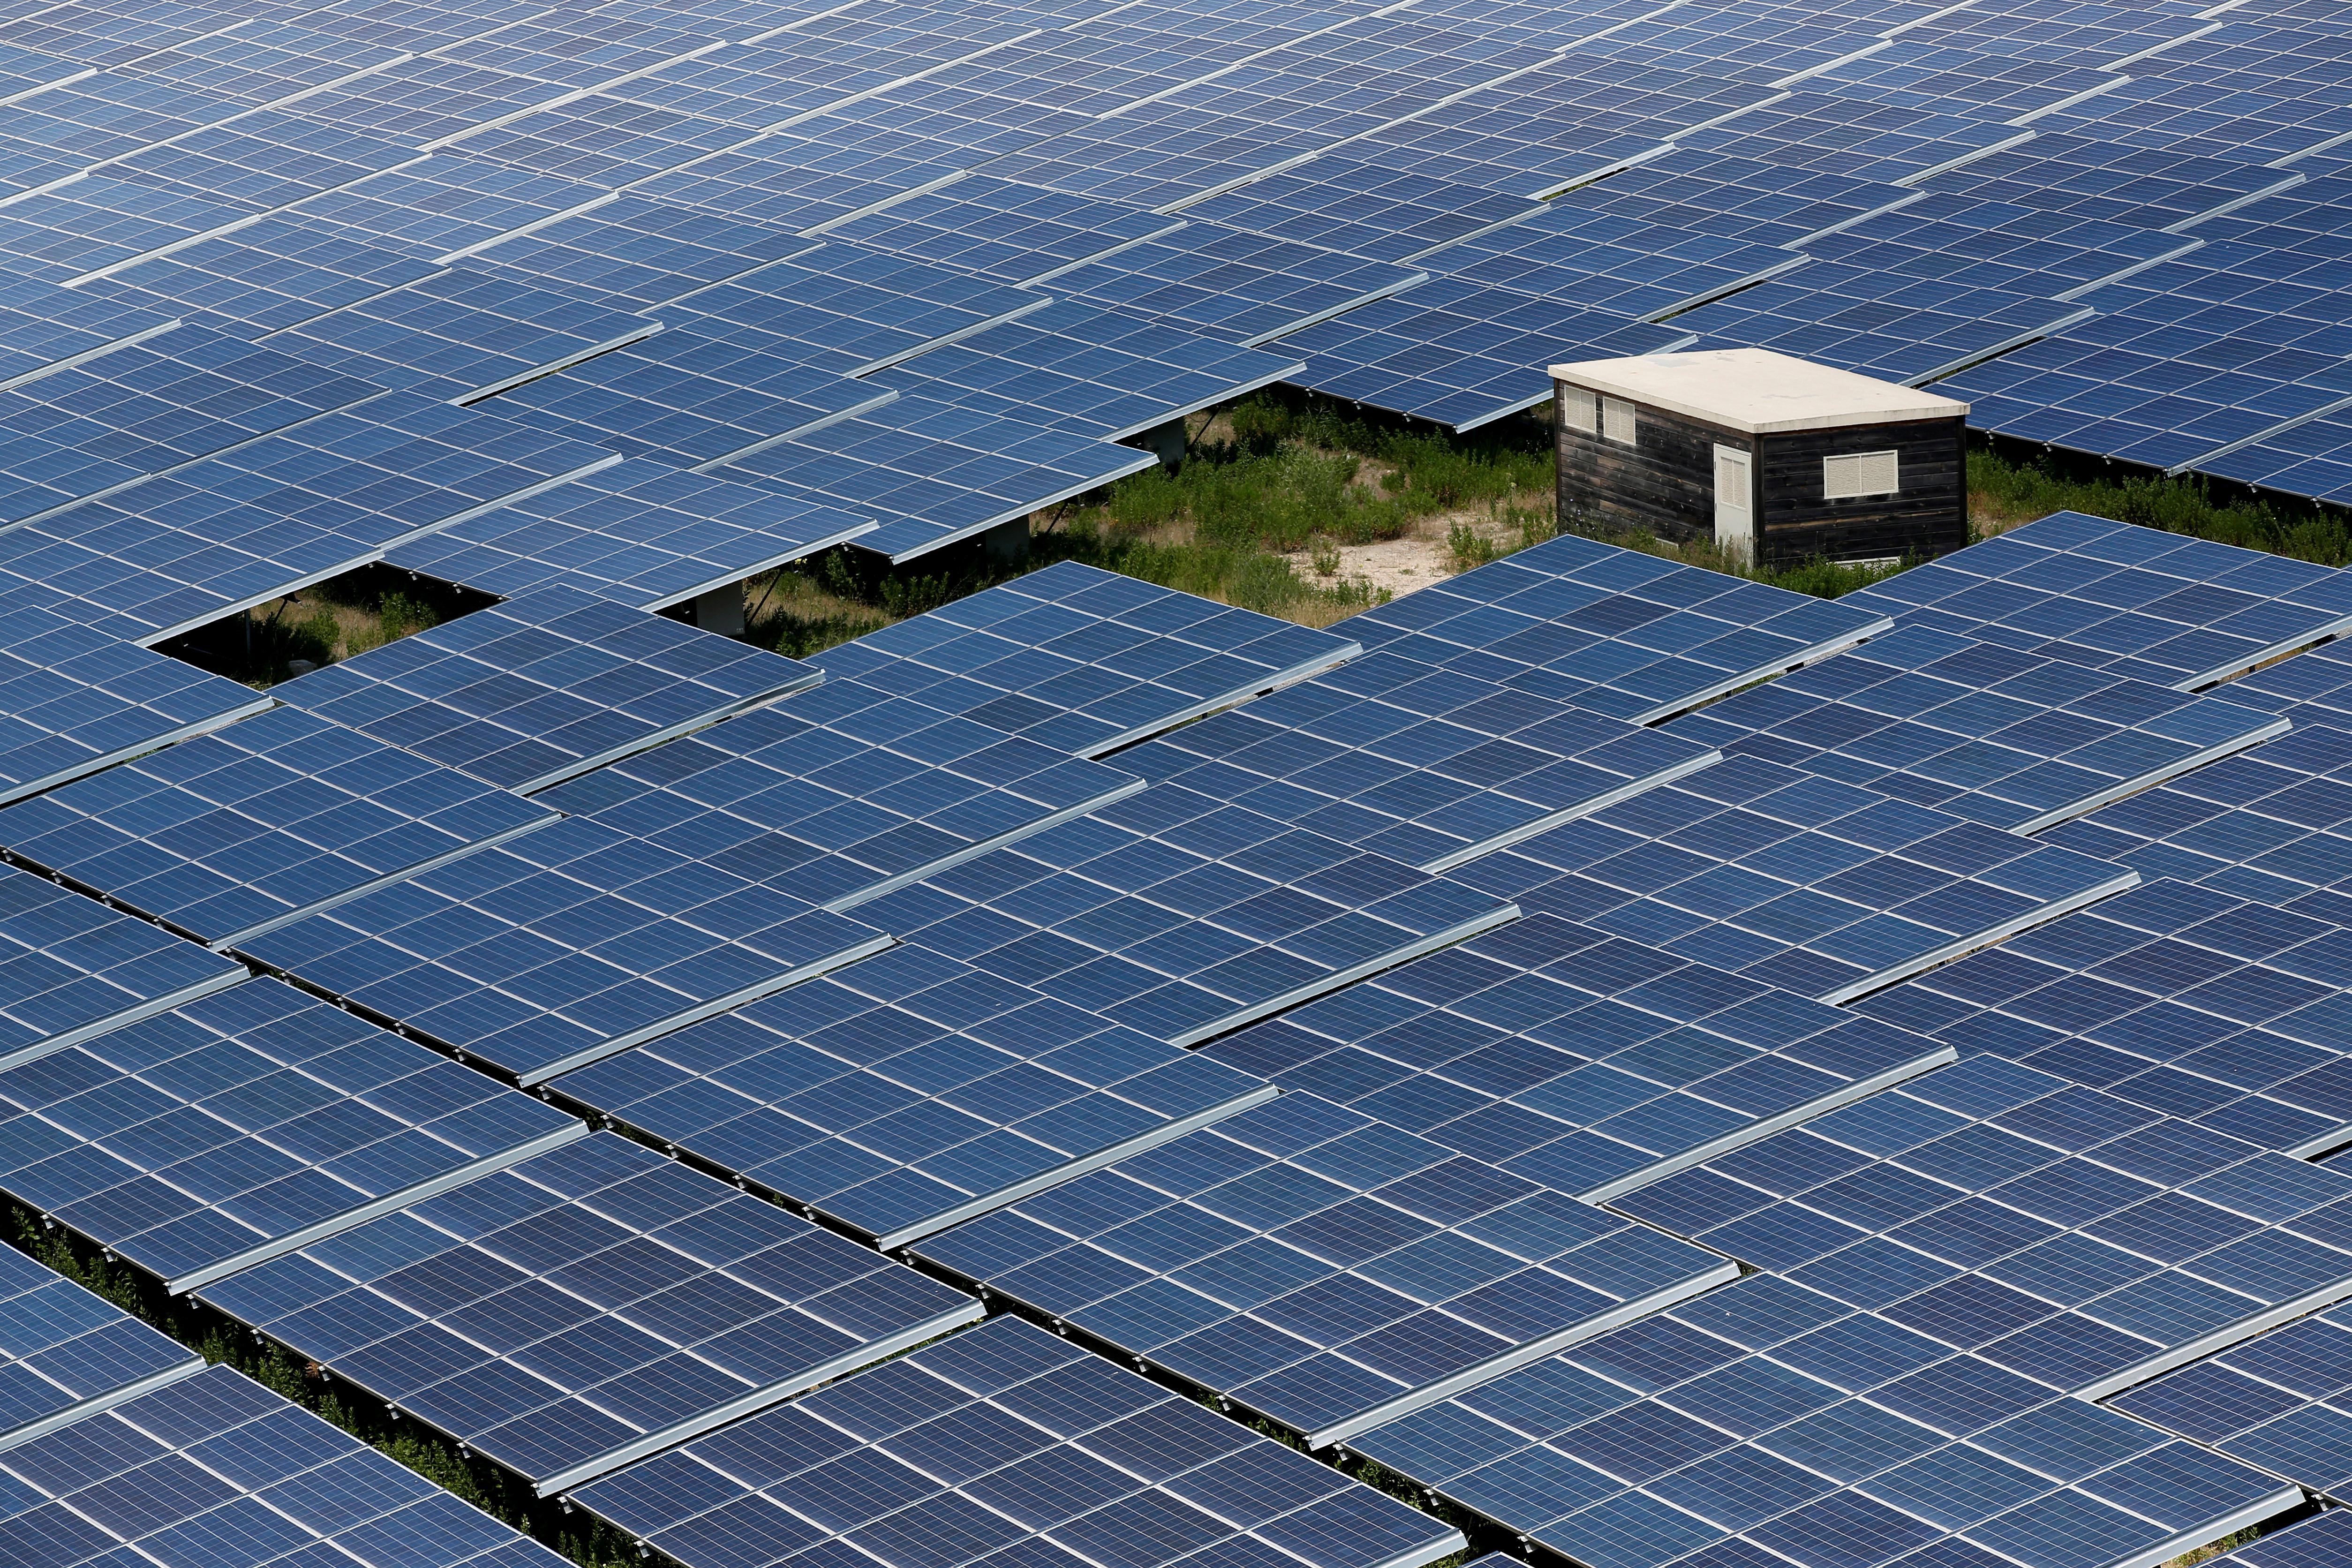 Solar panels to produce renewable energy are seen at the Urbasolar photovoltaic park in Gardanne, France, June 25, 2018.    REUTERS/Jean-Paul Pelissier